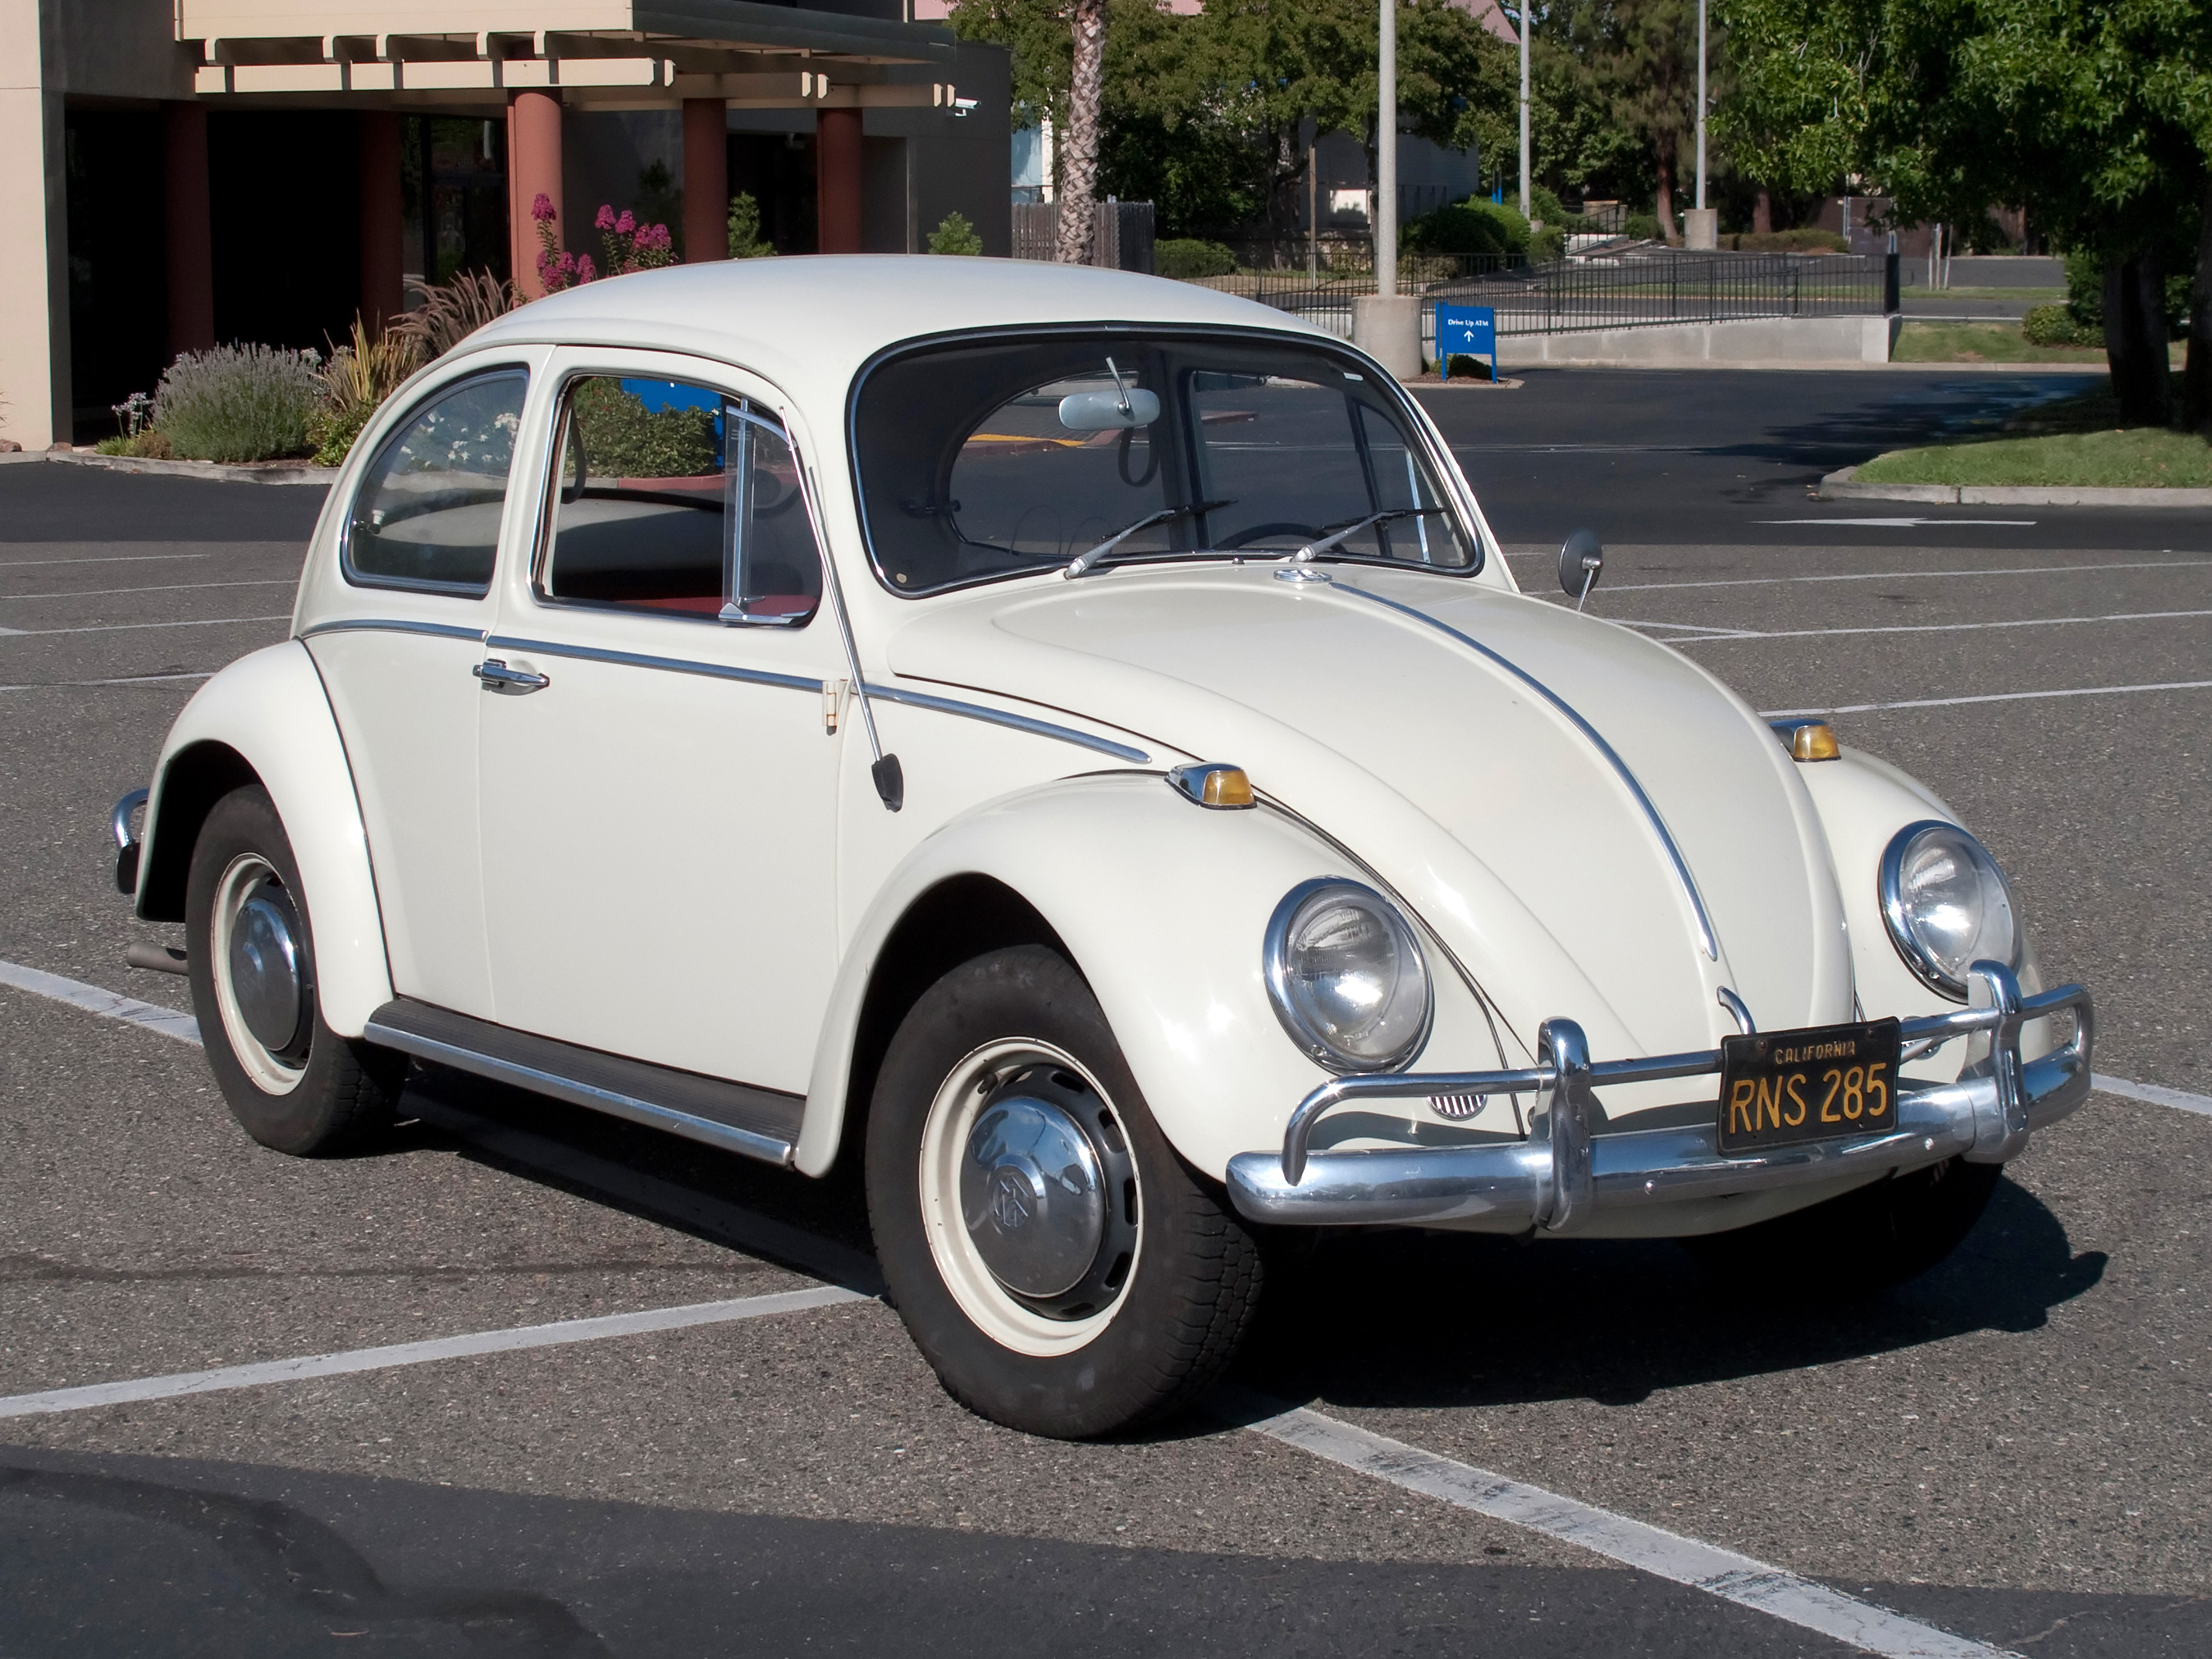 VW Volkswagen Rabbit GTI Locking Gas Fuel Tank Cap 2 Keys Chrome 80 81 82 83 84